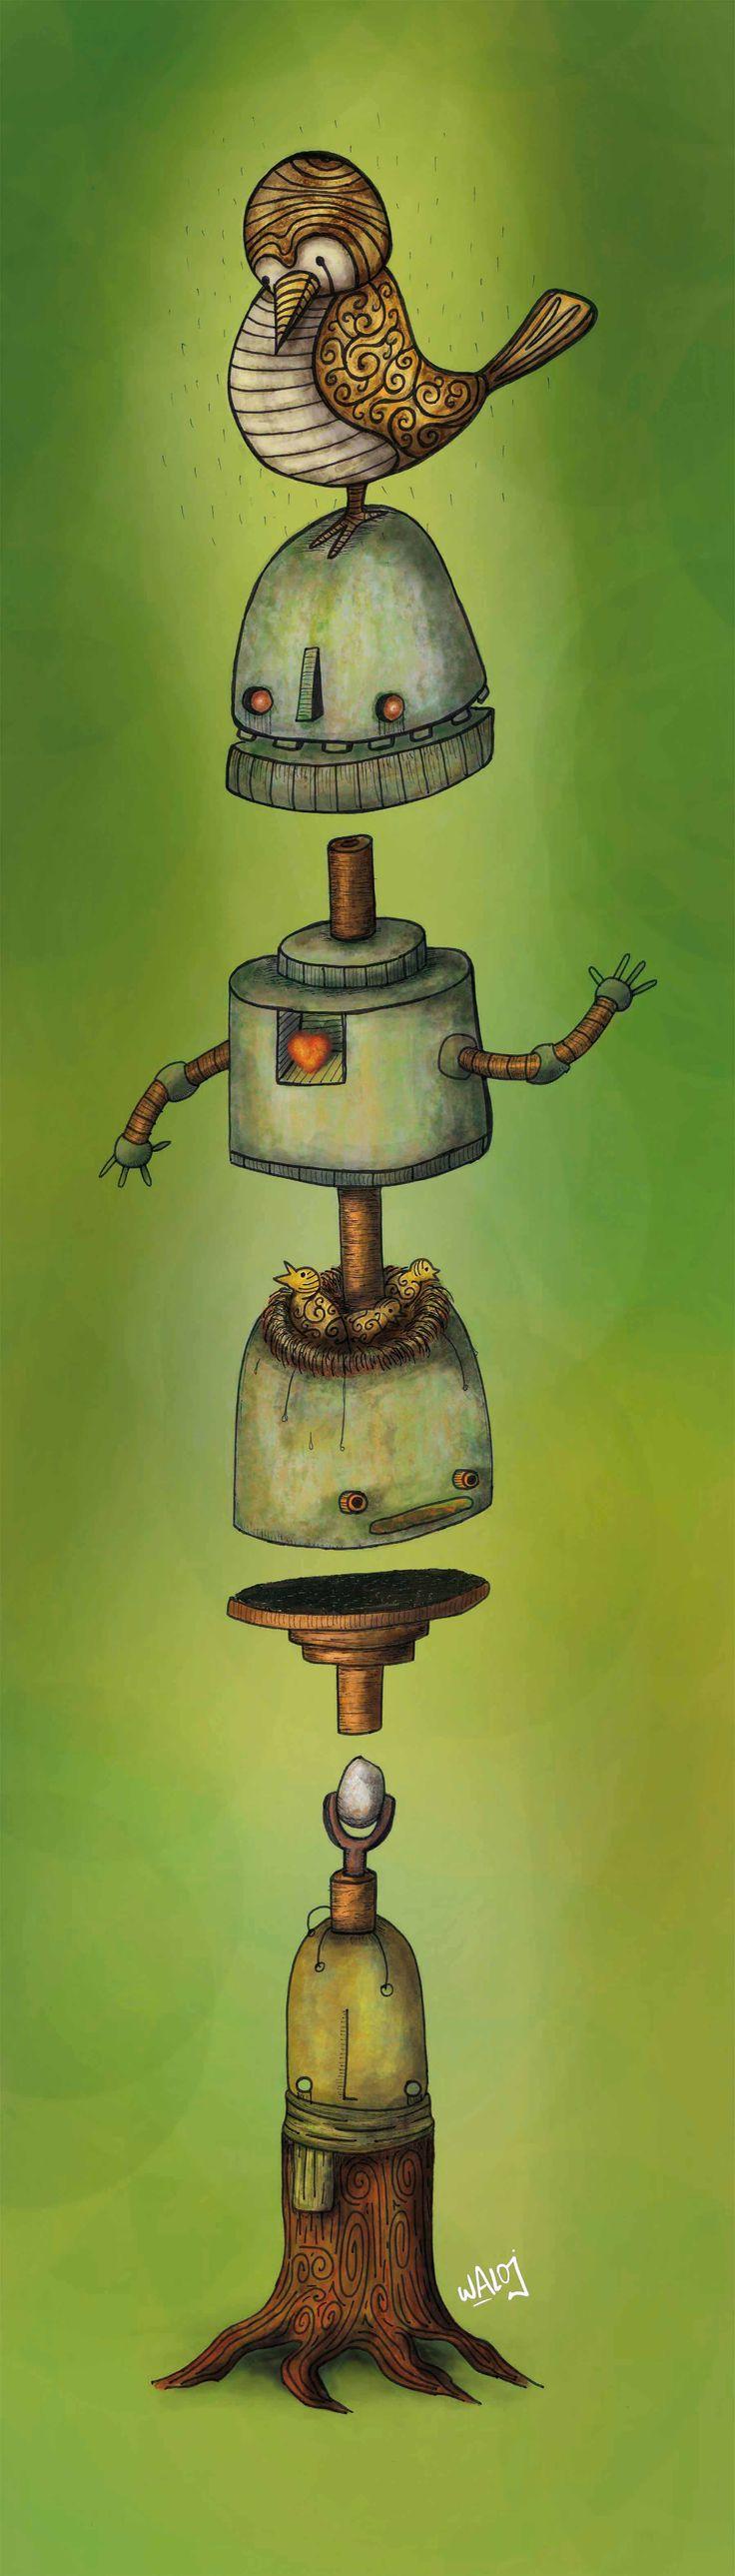 Cuando la naturaleza se fusiona con los robots #birds#machine #trees #gaia #ilustracion #illustration #digital#drawing #draw #dibujo